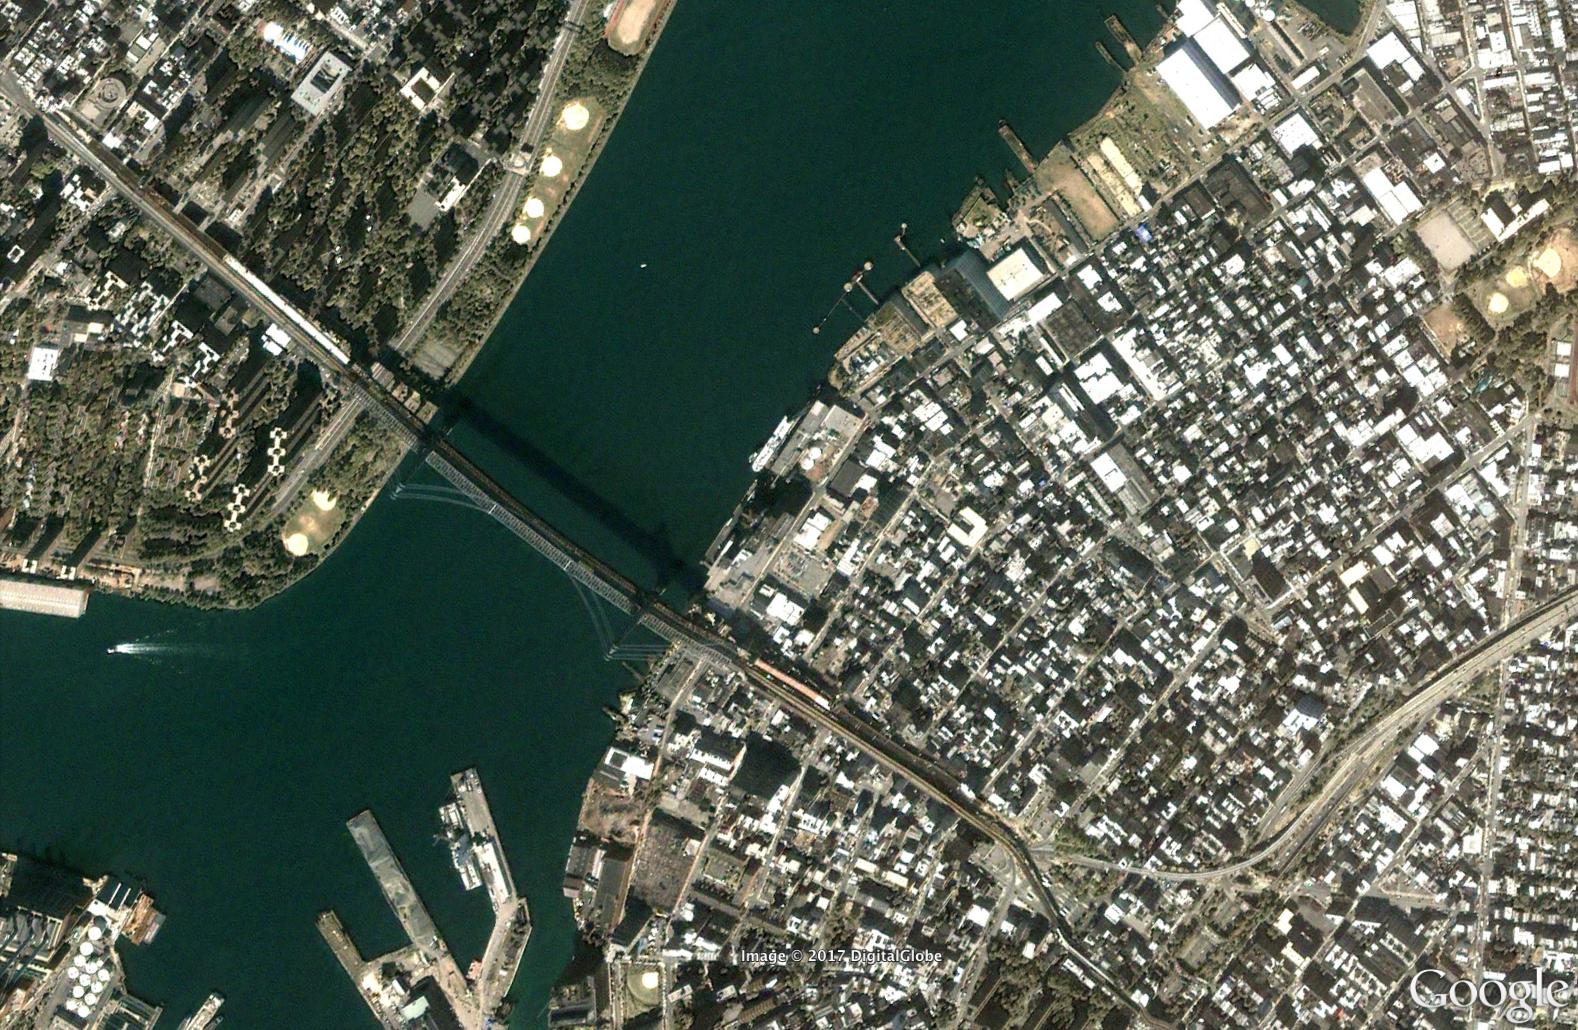 Condominium Complexes Long Island Ny